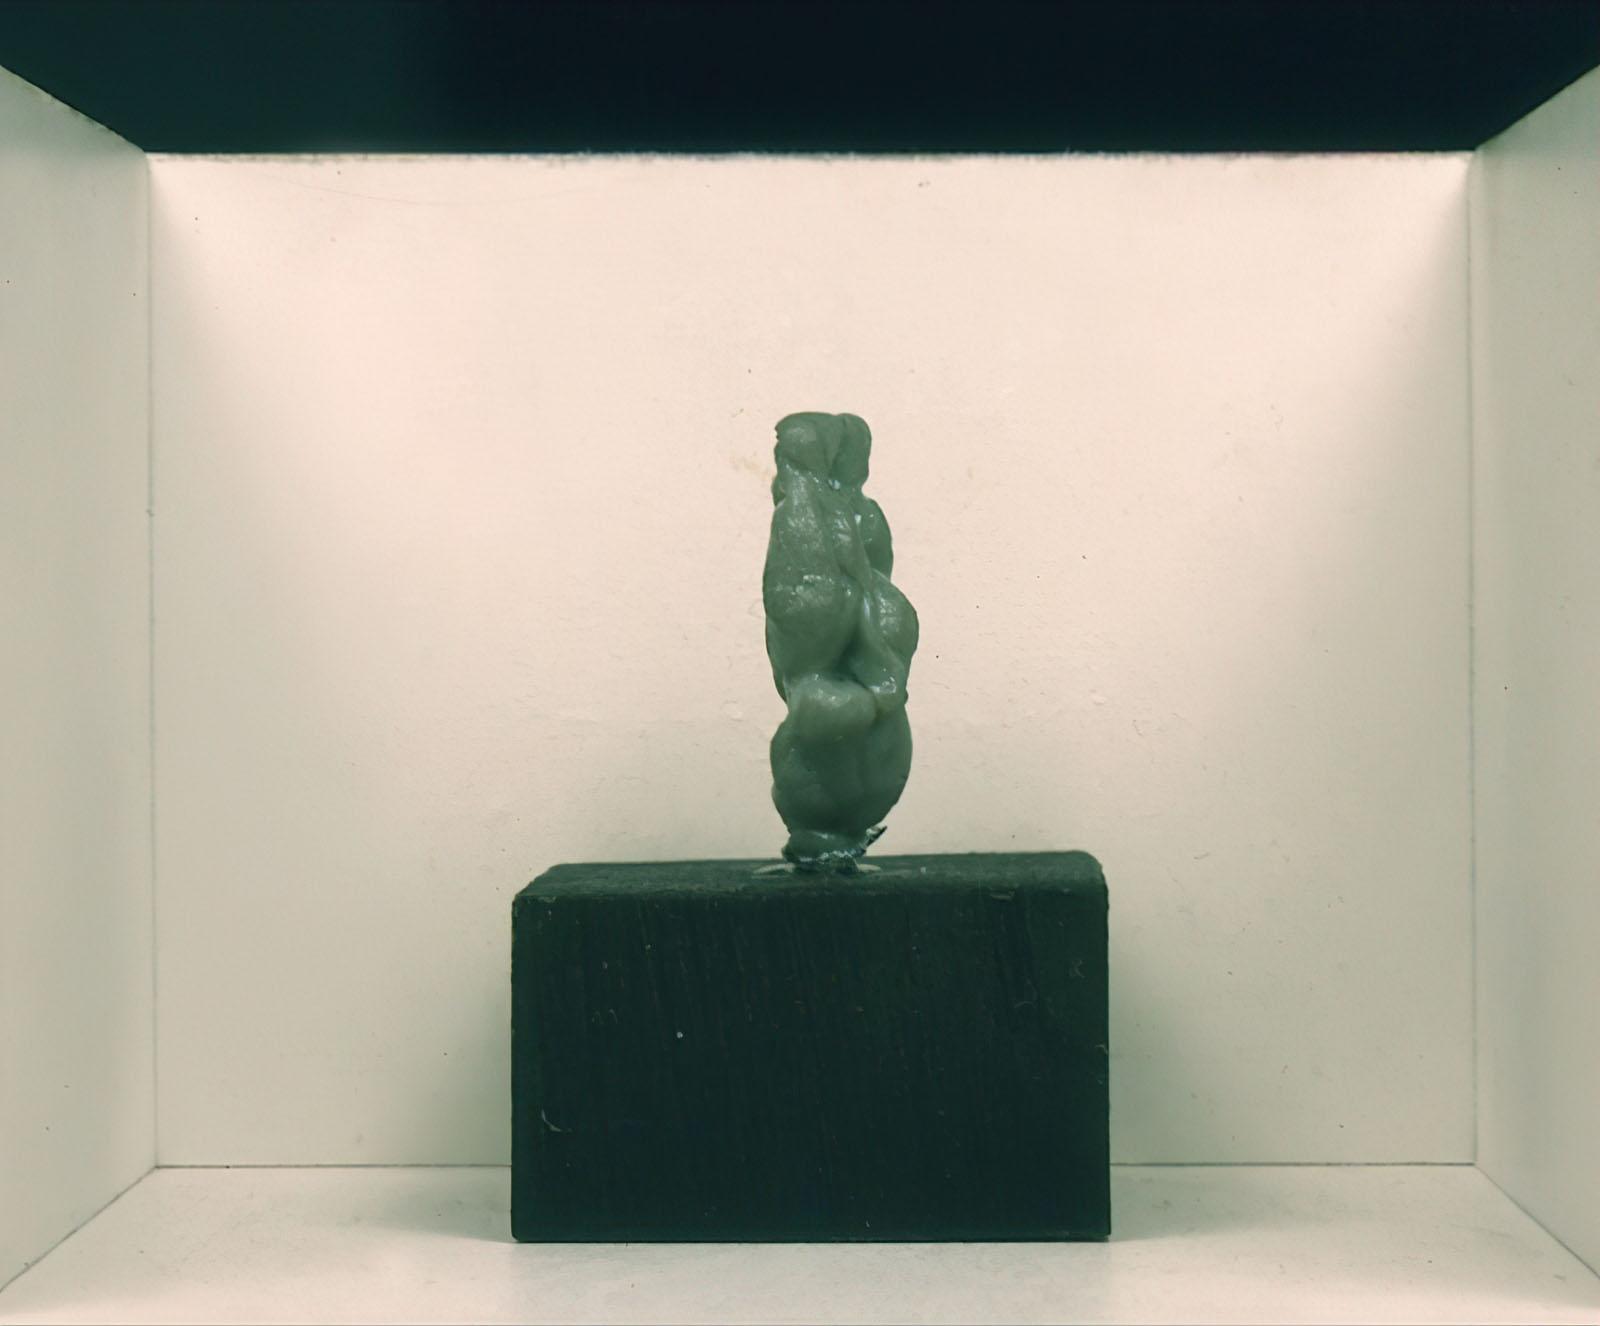 Les Levine - Untitled